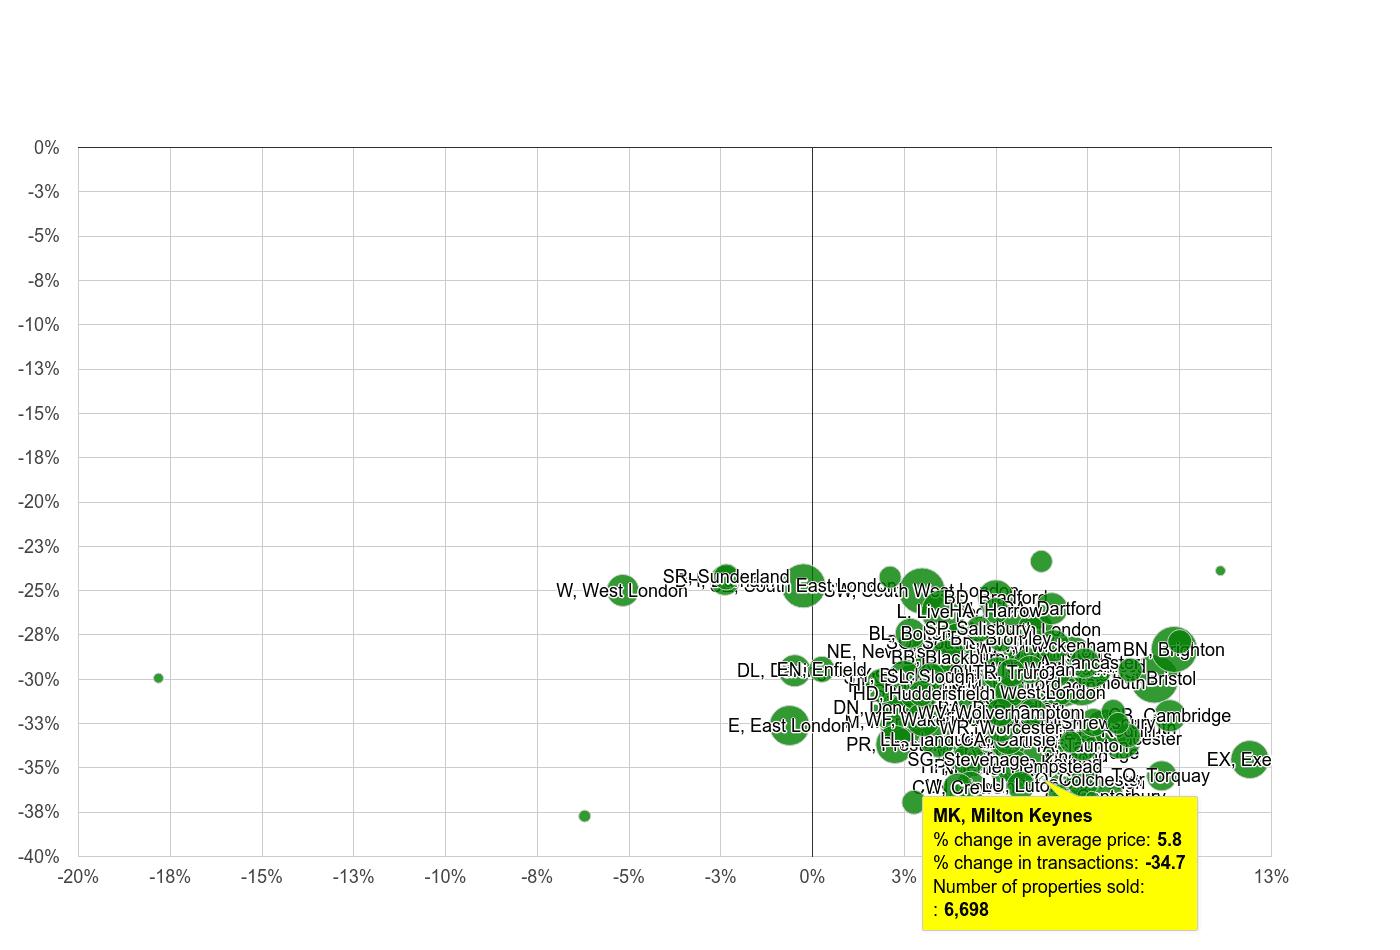 Milton Keynes property price and sales volume change relative to other postcode areas